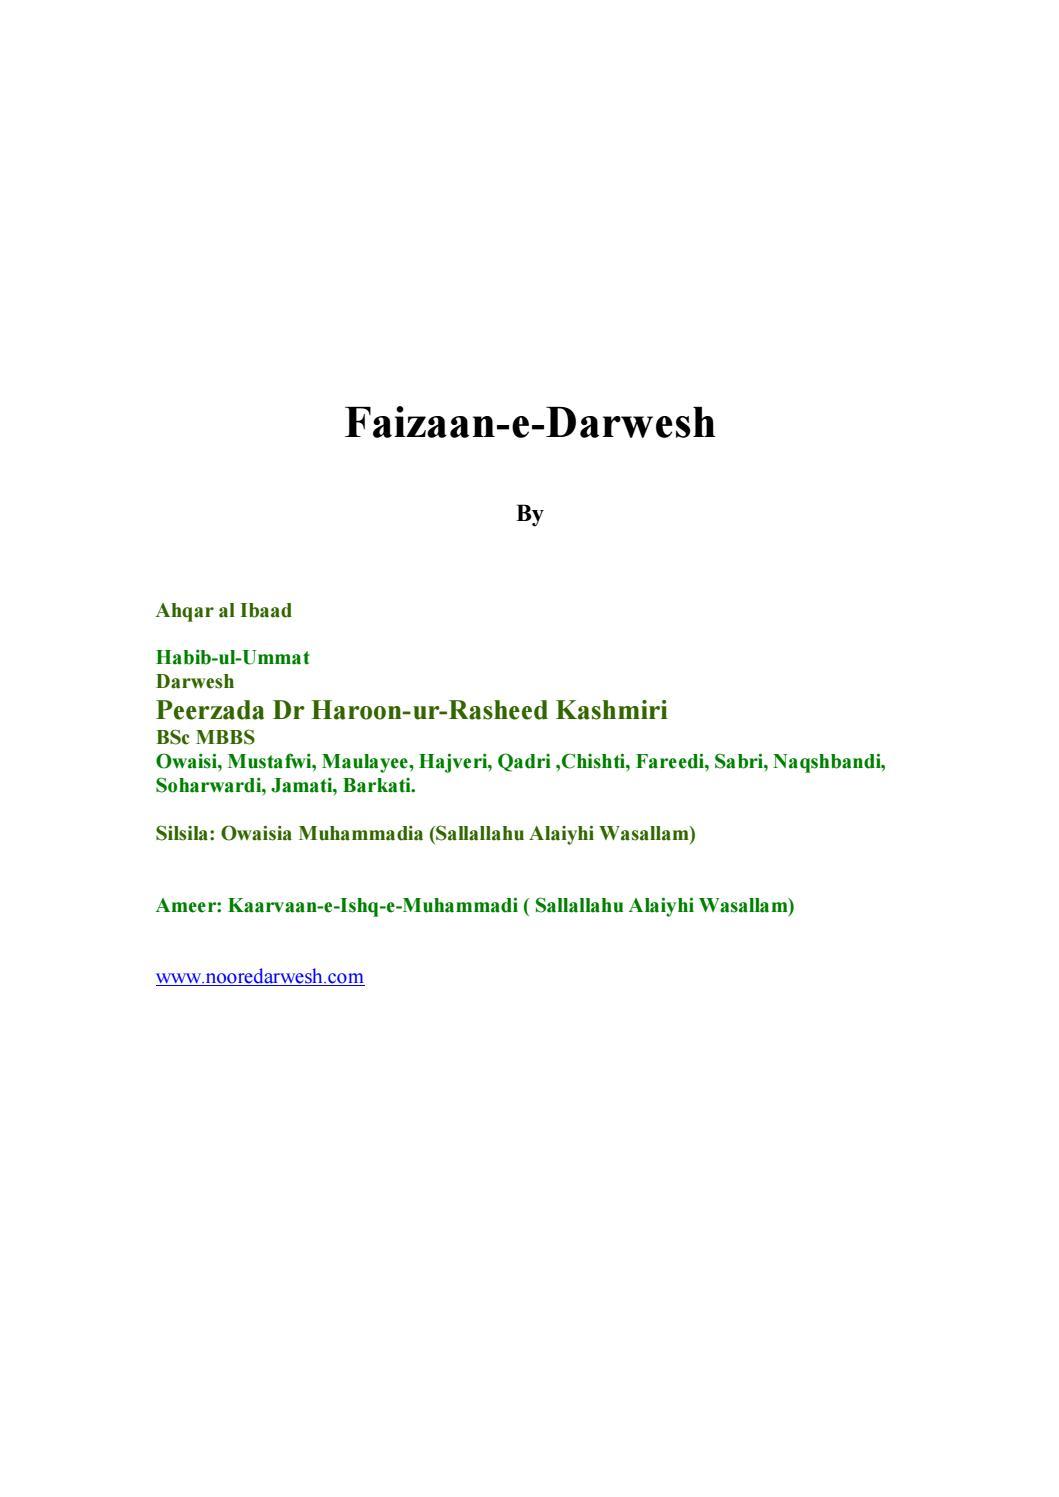 Faizaanedarwesh by Perjada Nurmohamad - issuu